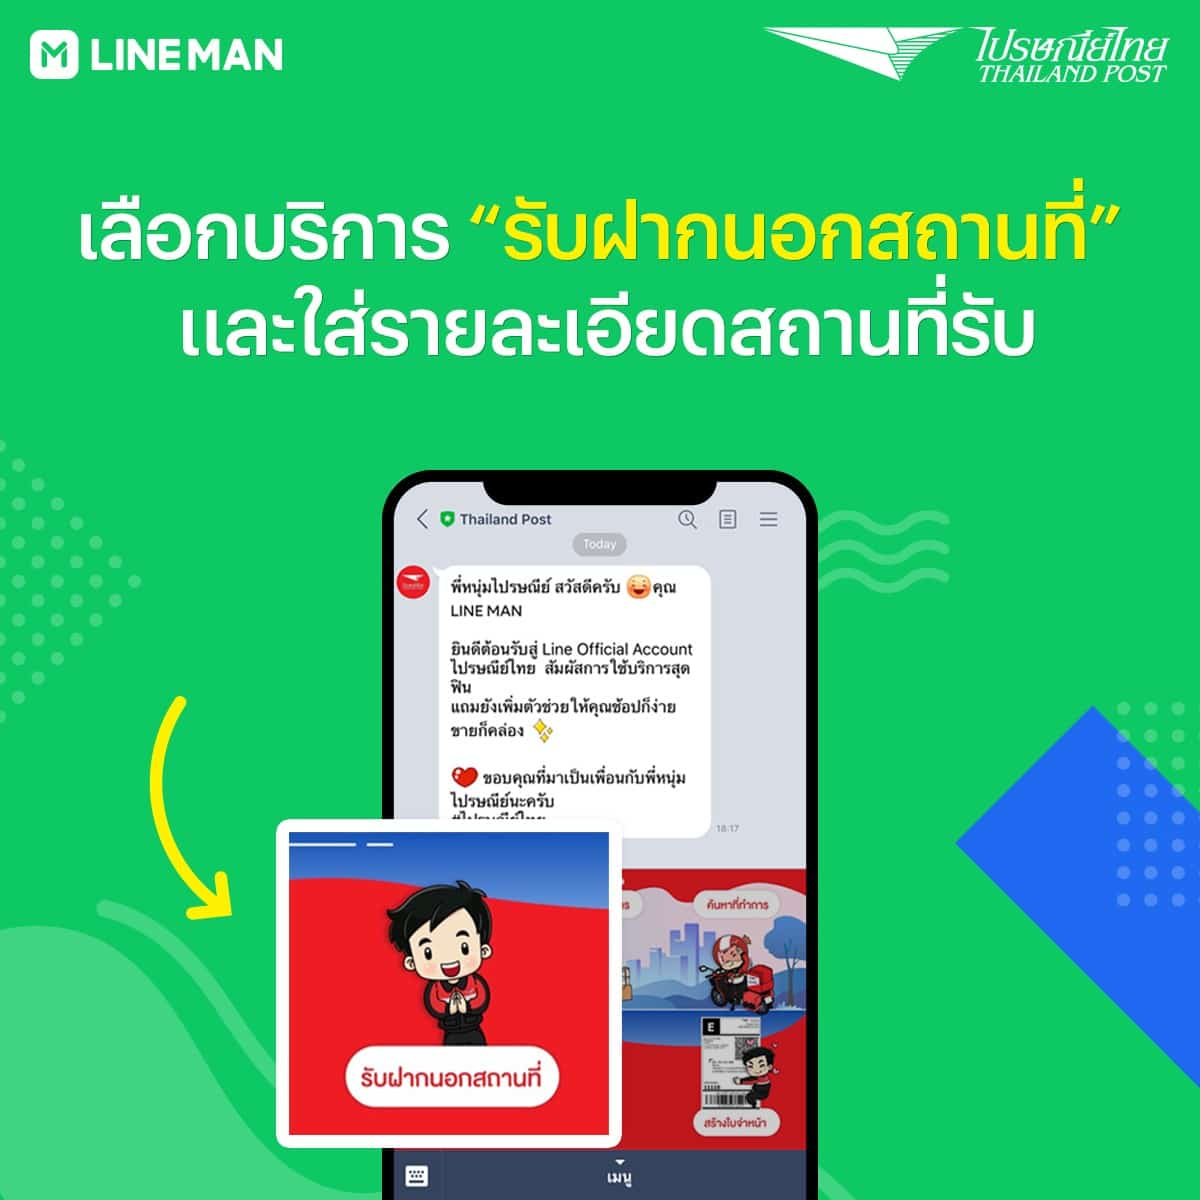 LINE Thailand Post 00004 - ไปรษณีย์ไทย ลดค่าส่ง 5 บาทต่อกล่อง เพียงใช้บริการผ่าน LINE Official Account